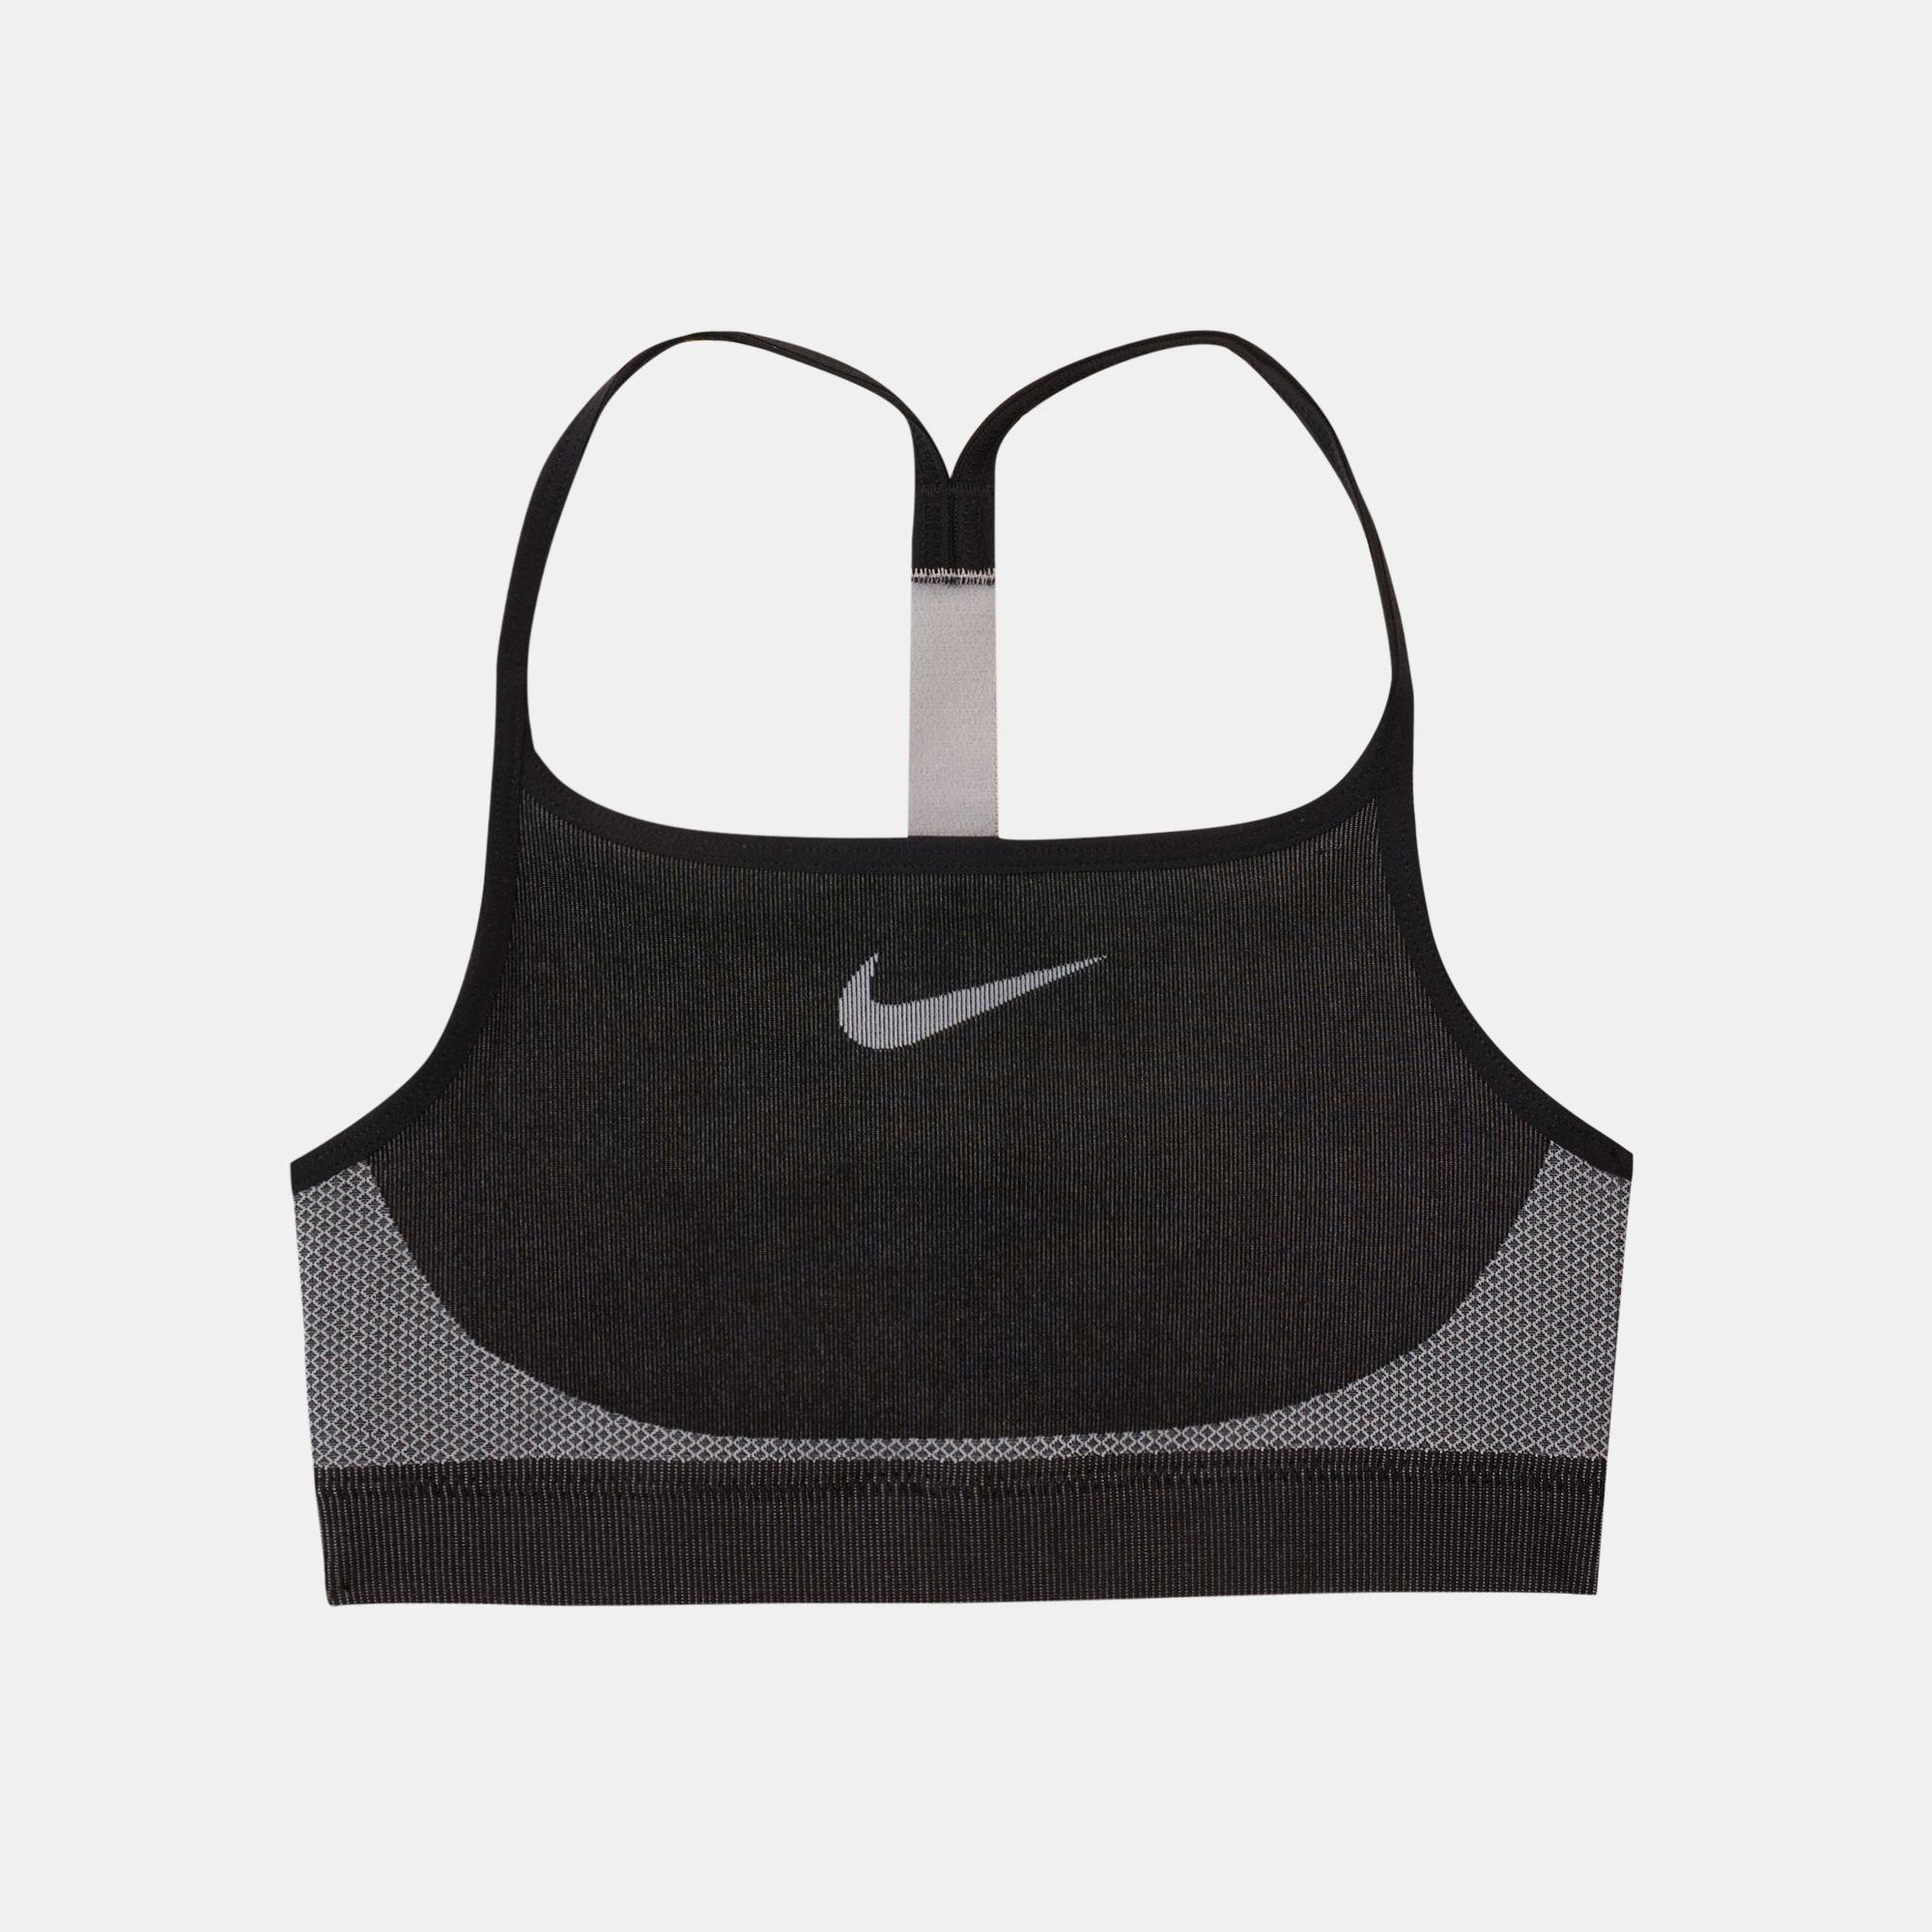 outlet store 1585b 59bda Nike Kids  Seamless Sports Bra (Older Kids)   Sports Bra   Clothing ...